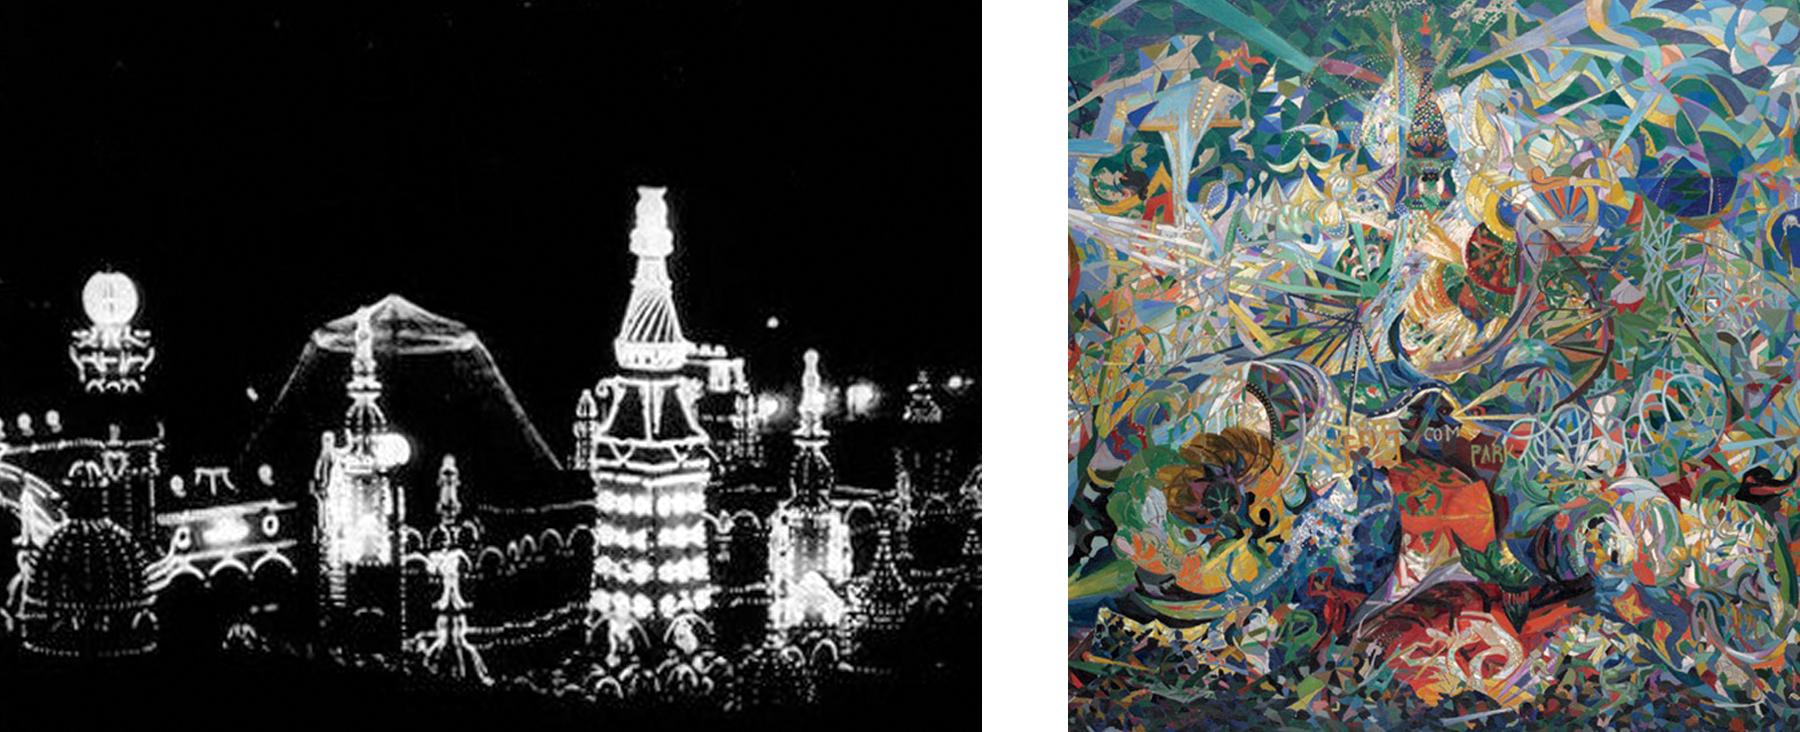 Coney Island in early cinema and modern art (1895-1914)